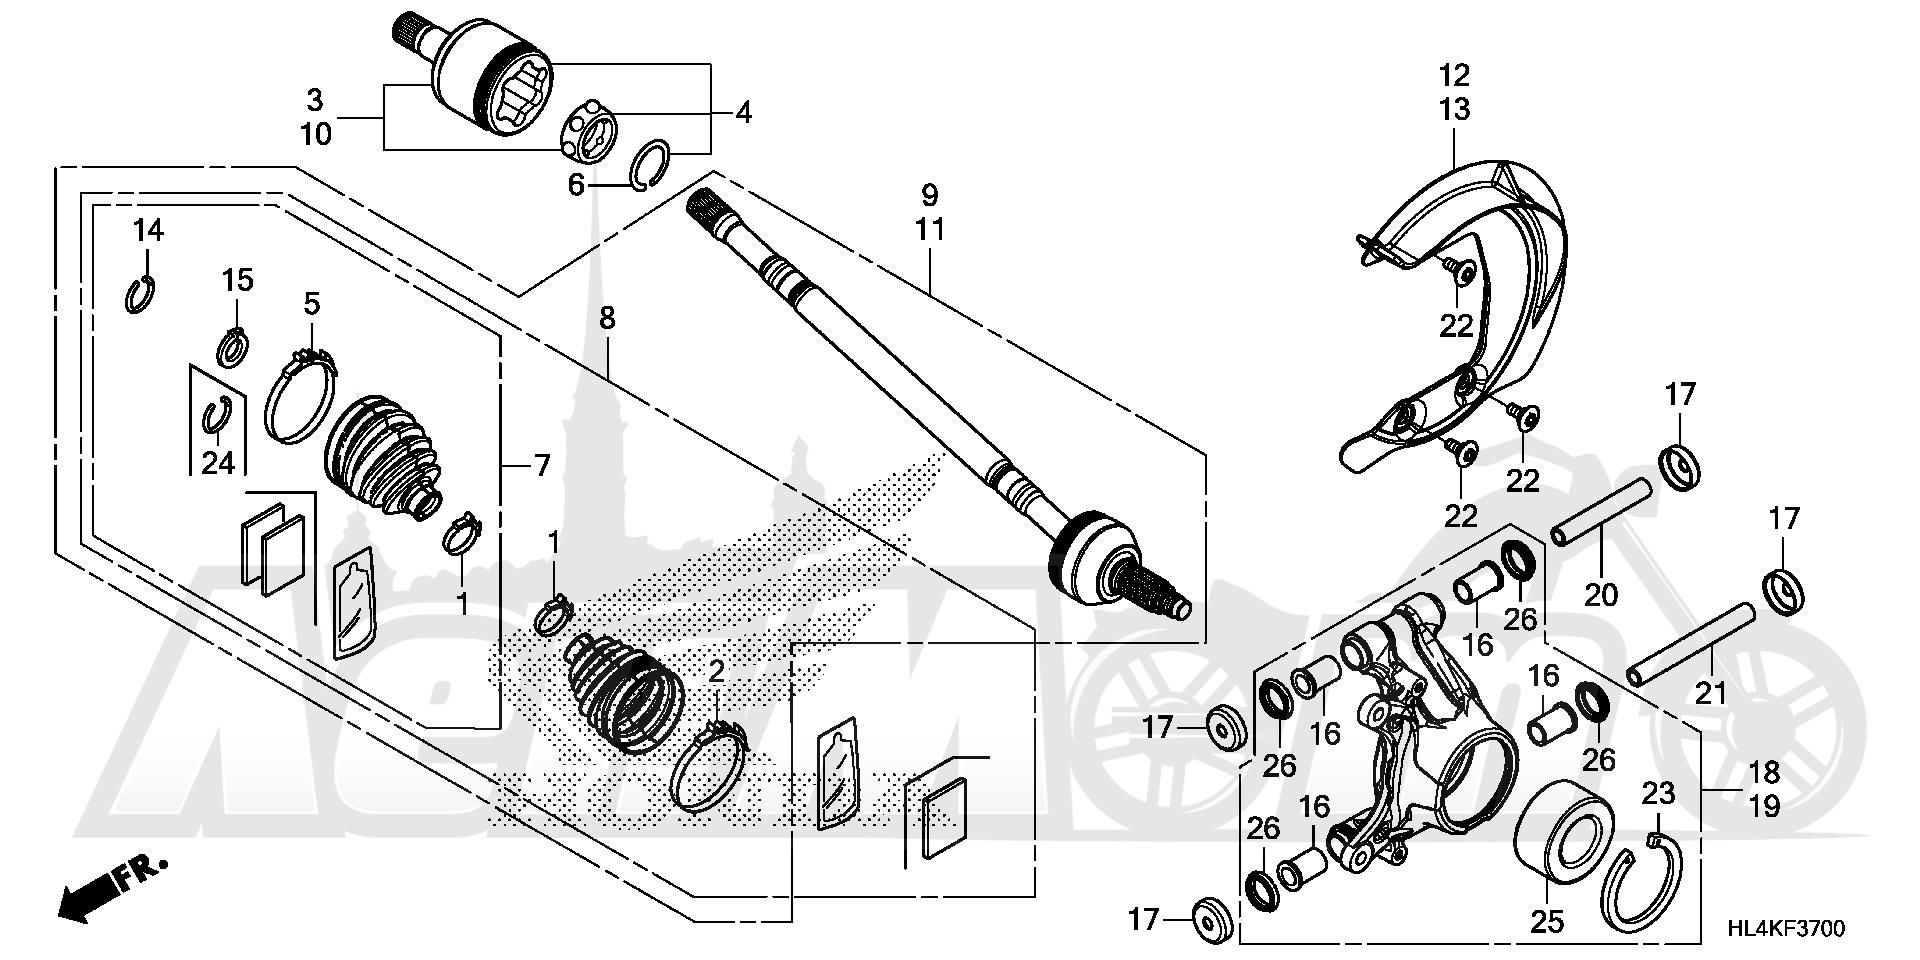 Запчасти для Квадроцикла Honda 2019 SXS1000M3P Раздел: REAR KNUCKLE AND REAR   зад кулак и зад